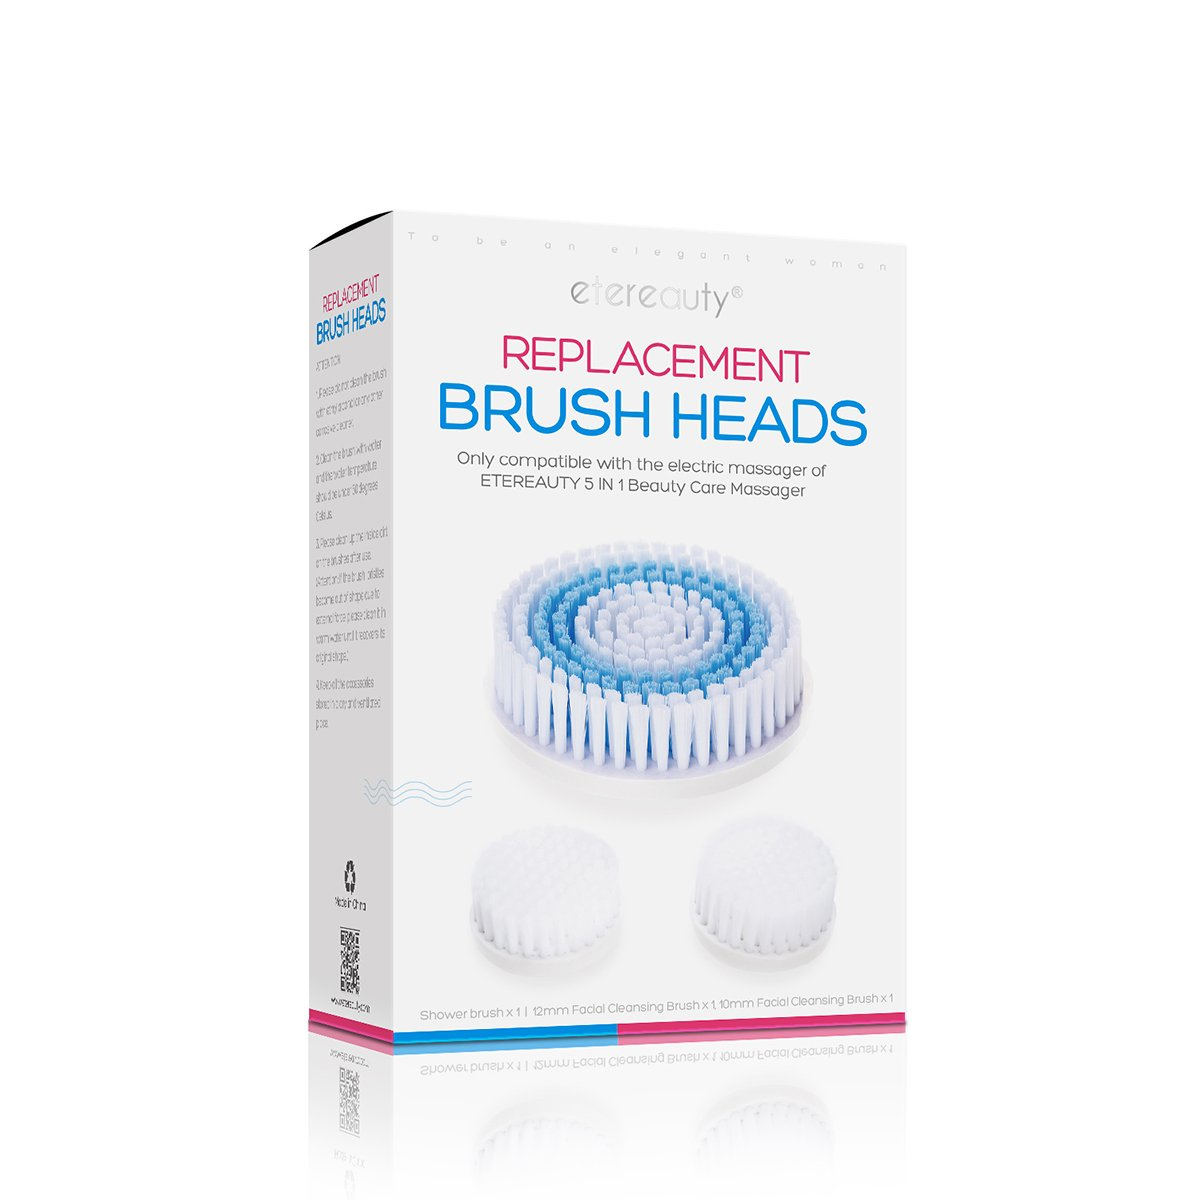 3Pcs Body Facial Cleansing Brush Head Replacement for 5 in 1 Waterproof Body Facial Brush